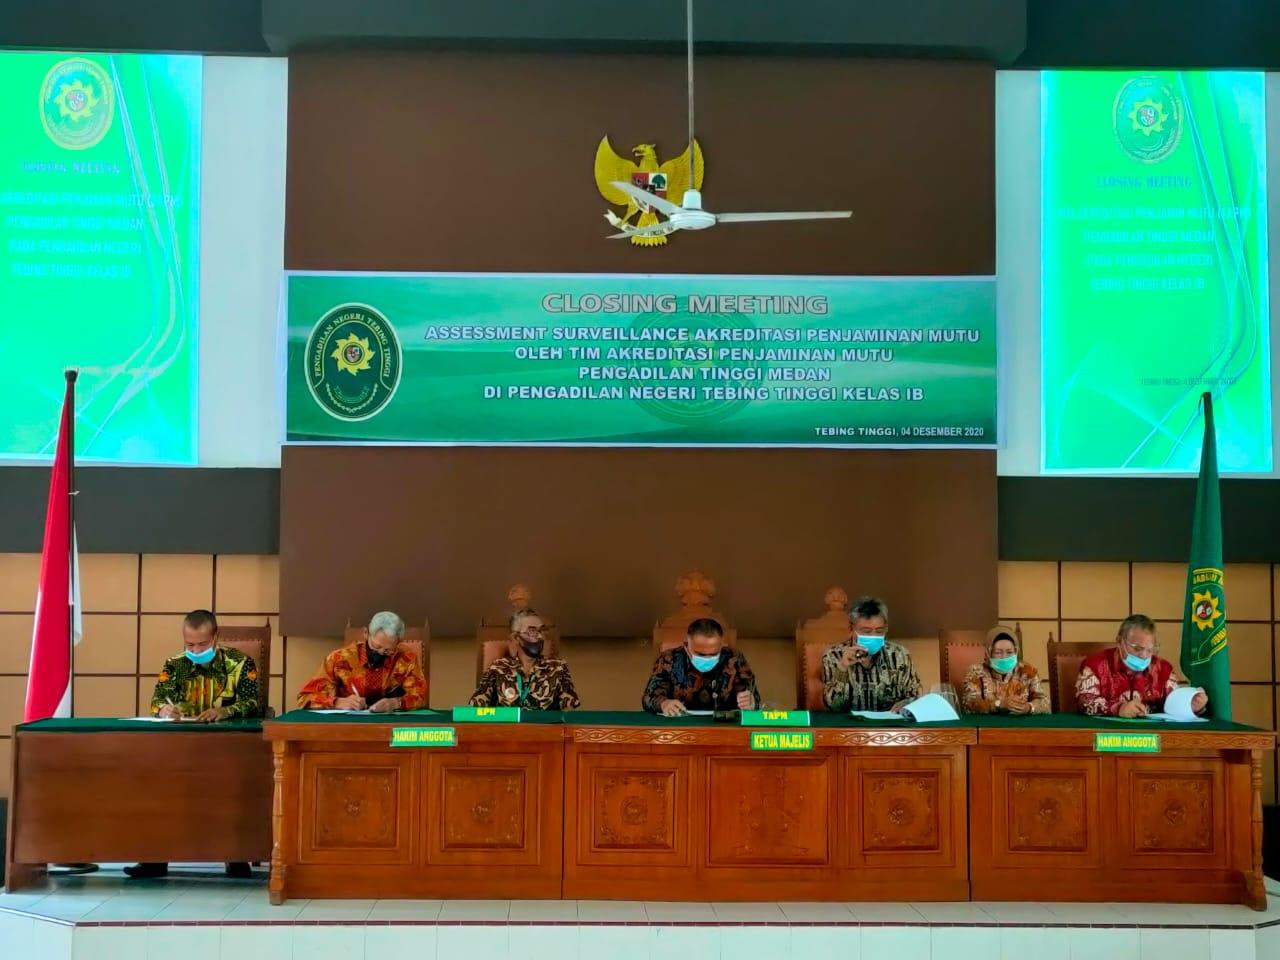 Closing Meeting Assesment Surveillance Akreditasi Penjaminan Mutu oleh Tim Akreditasi Penjaminan Mutu Pengadilan Tinggi Medan di Pengadilan Negeri Tebing Tinggi